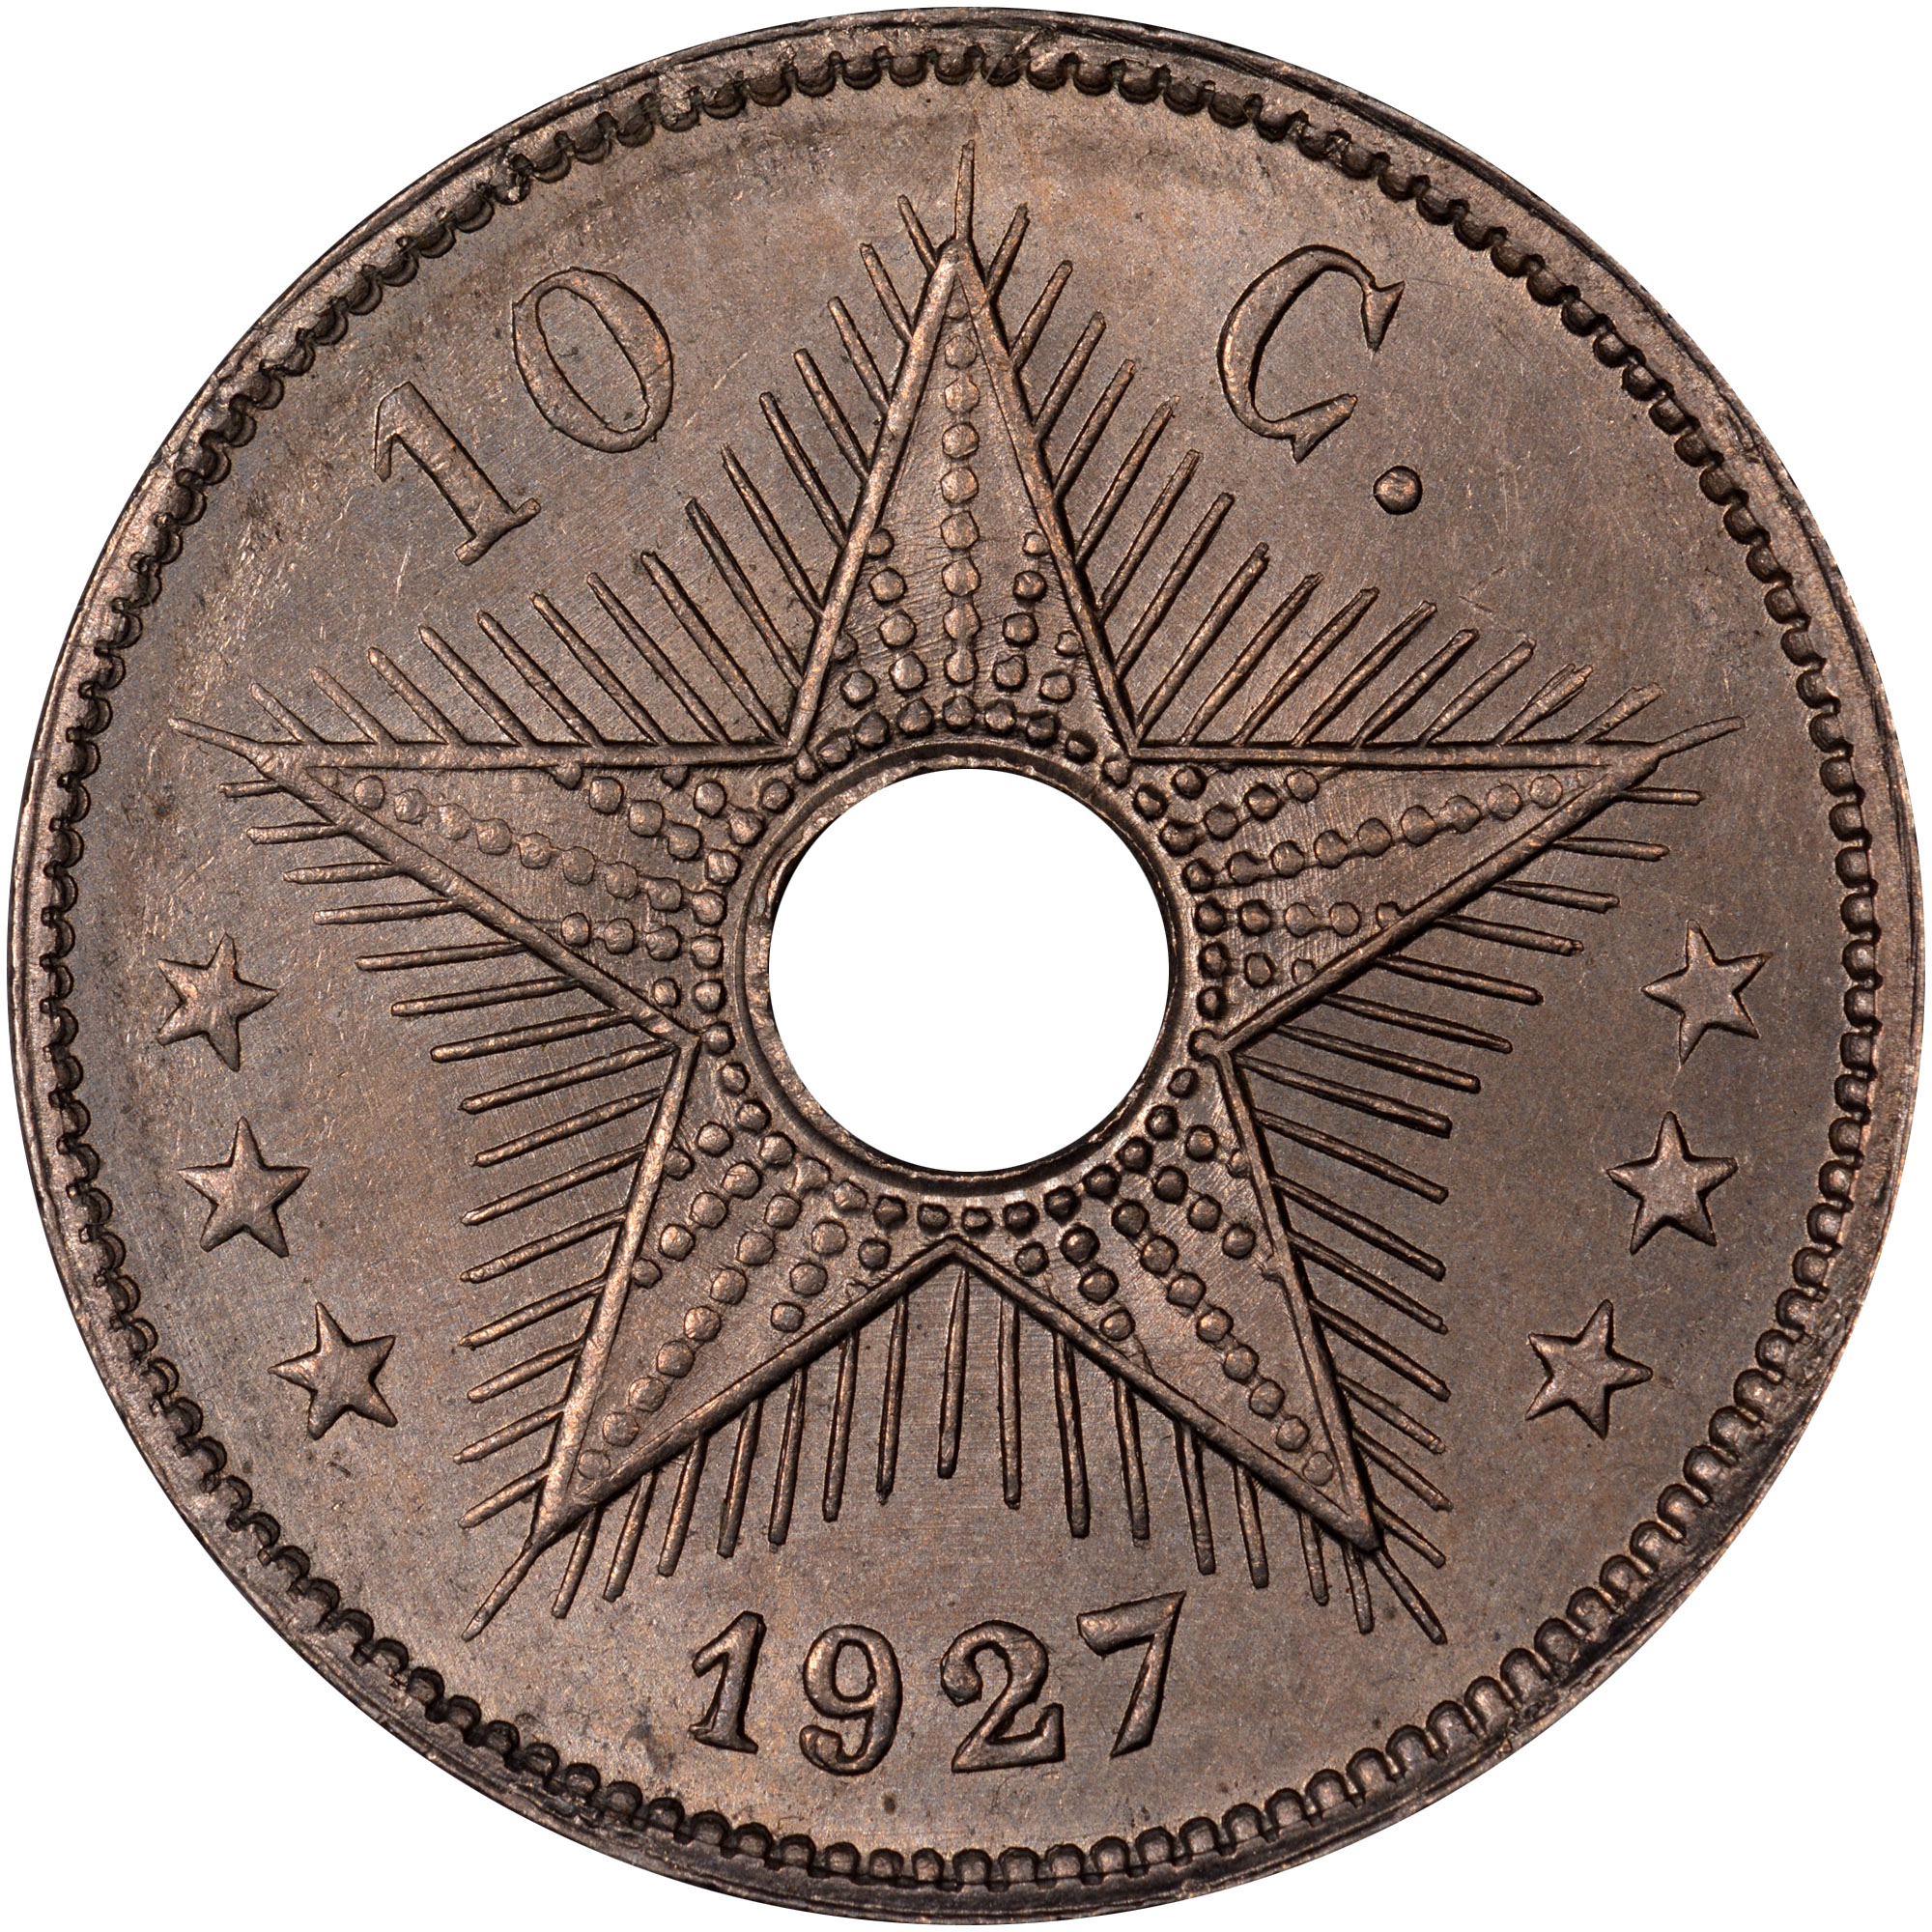 1910-1928/7 Belgian Congo 10 Centimes reverse